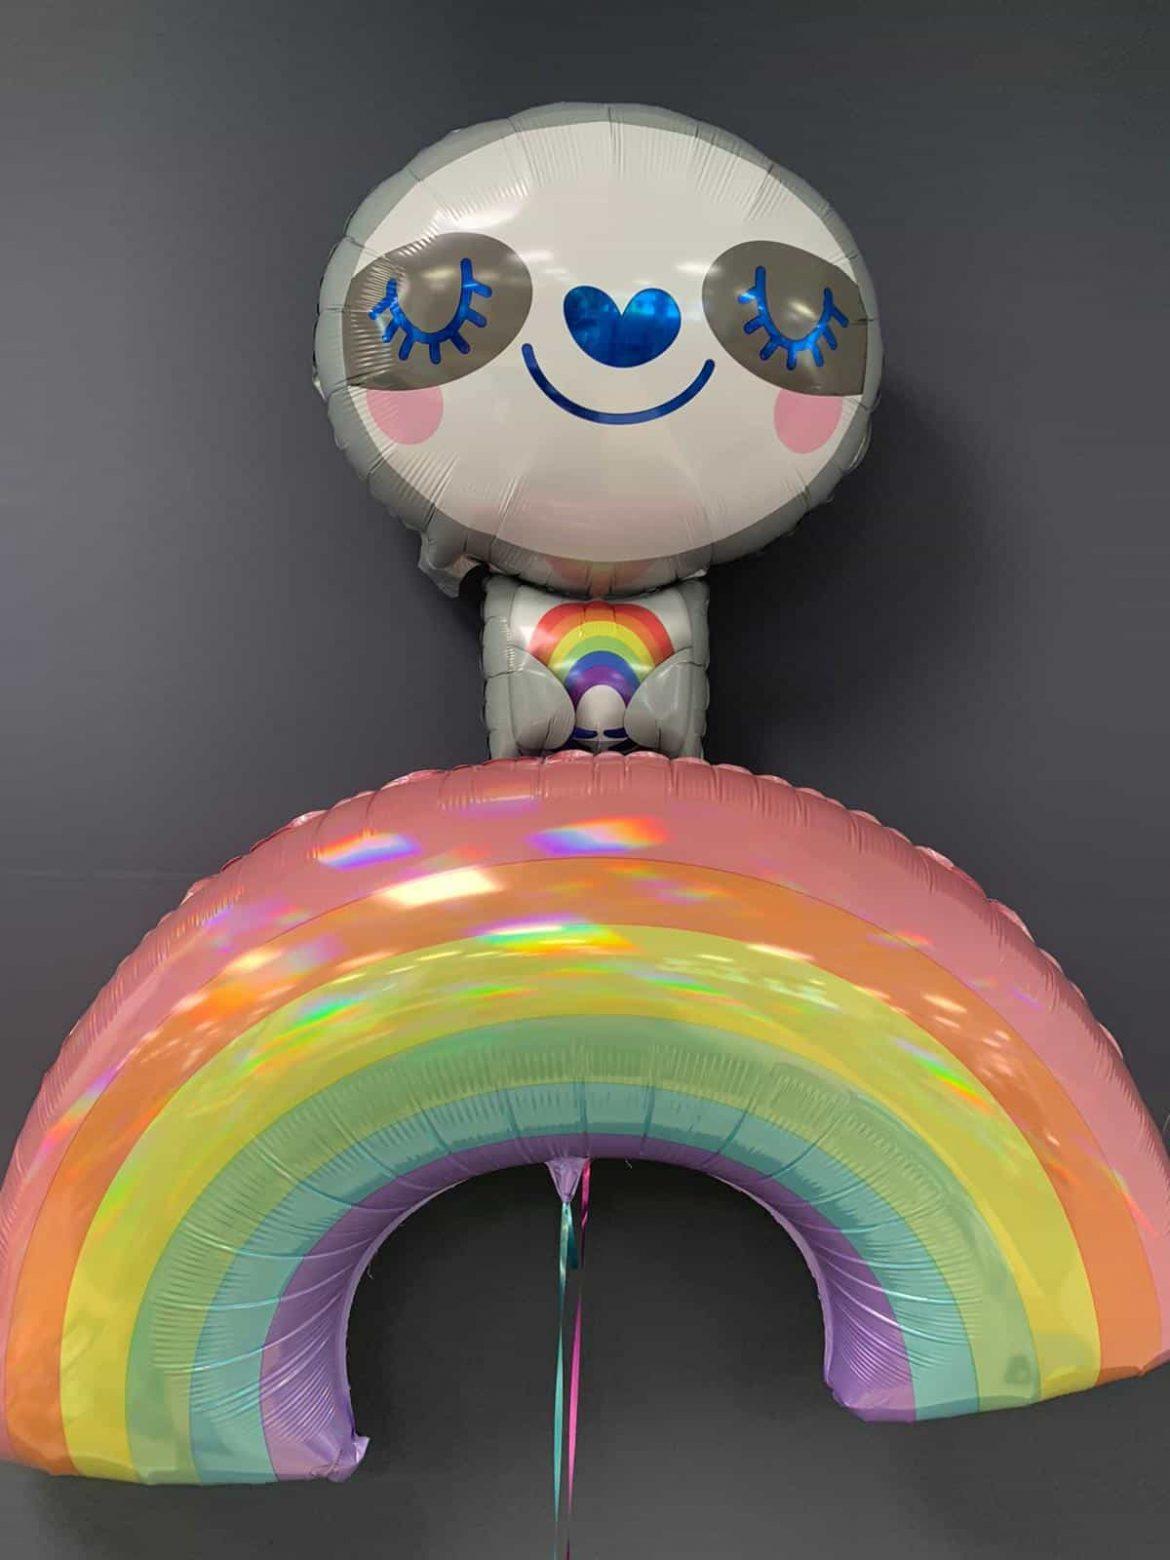 Faultierballon € 5,90<br />Regenbogen € 7,90 1